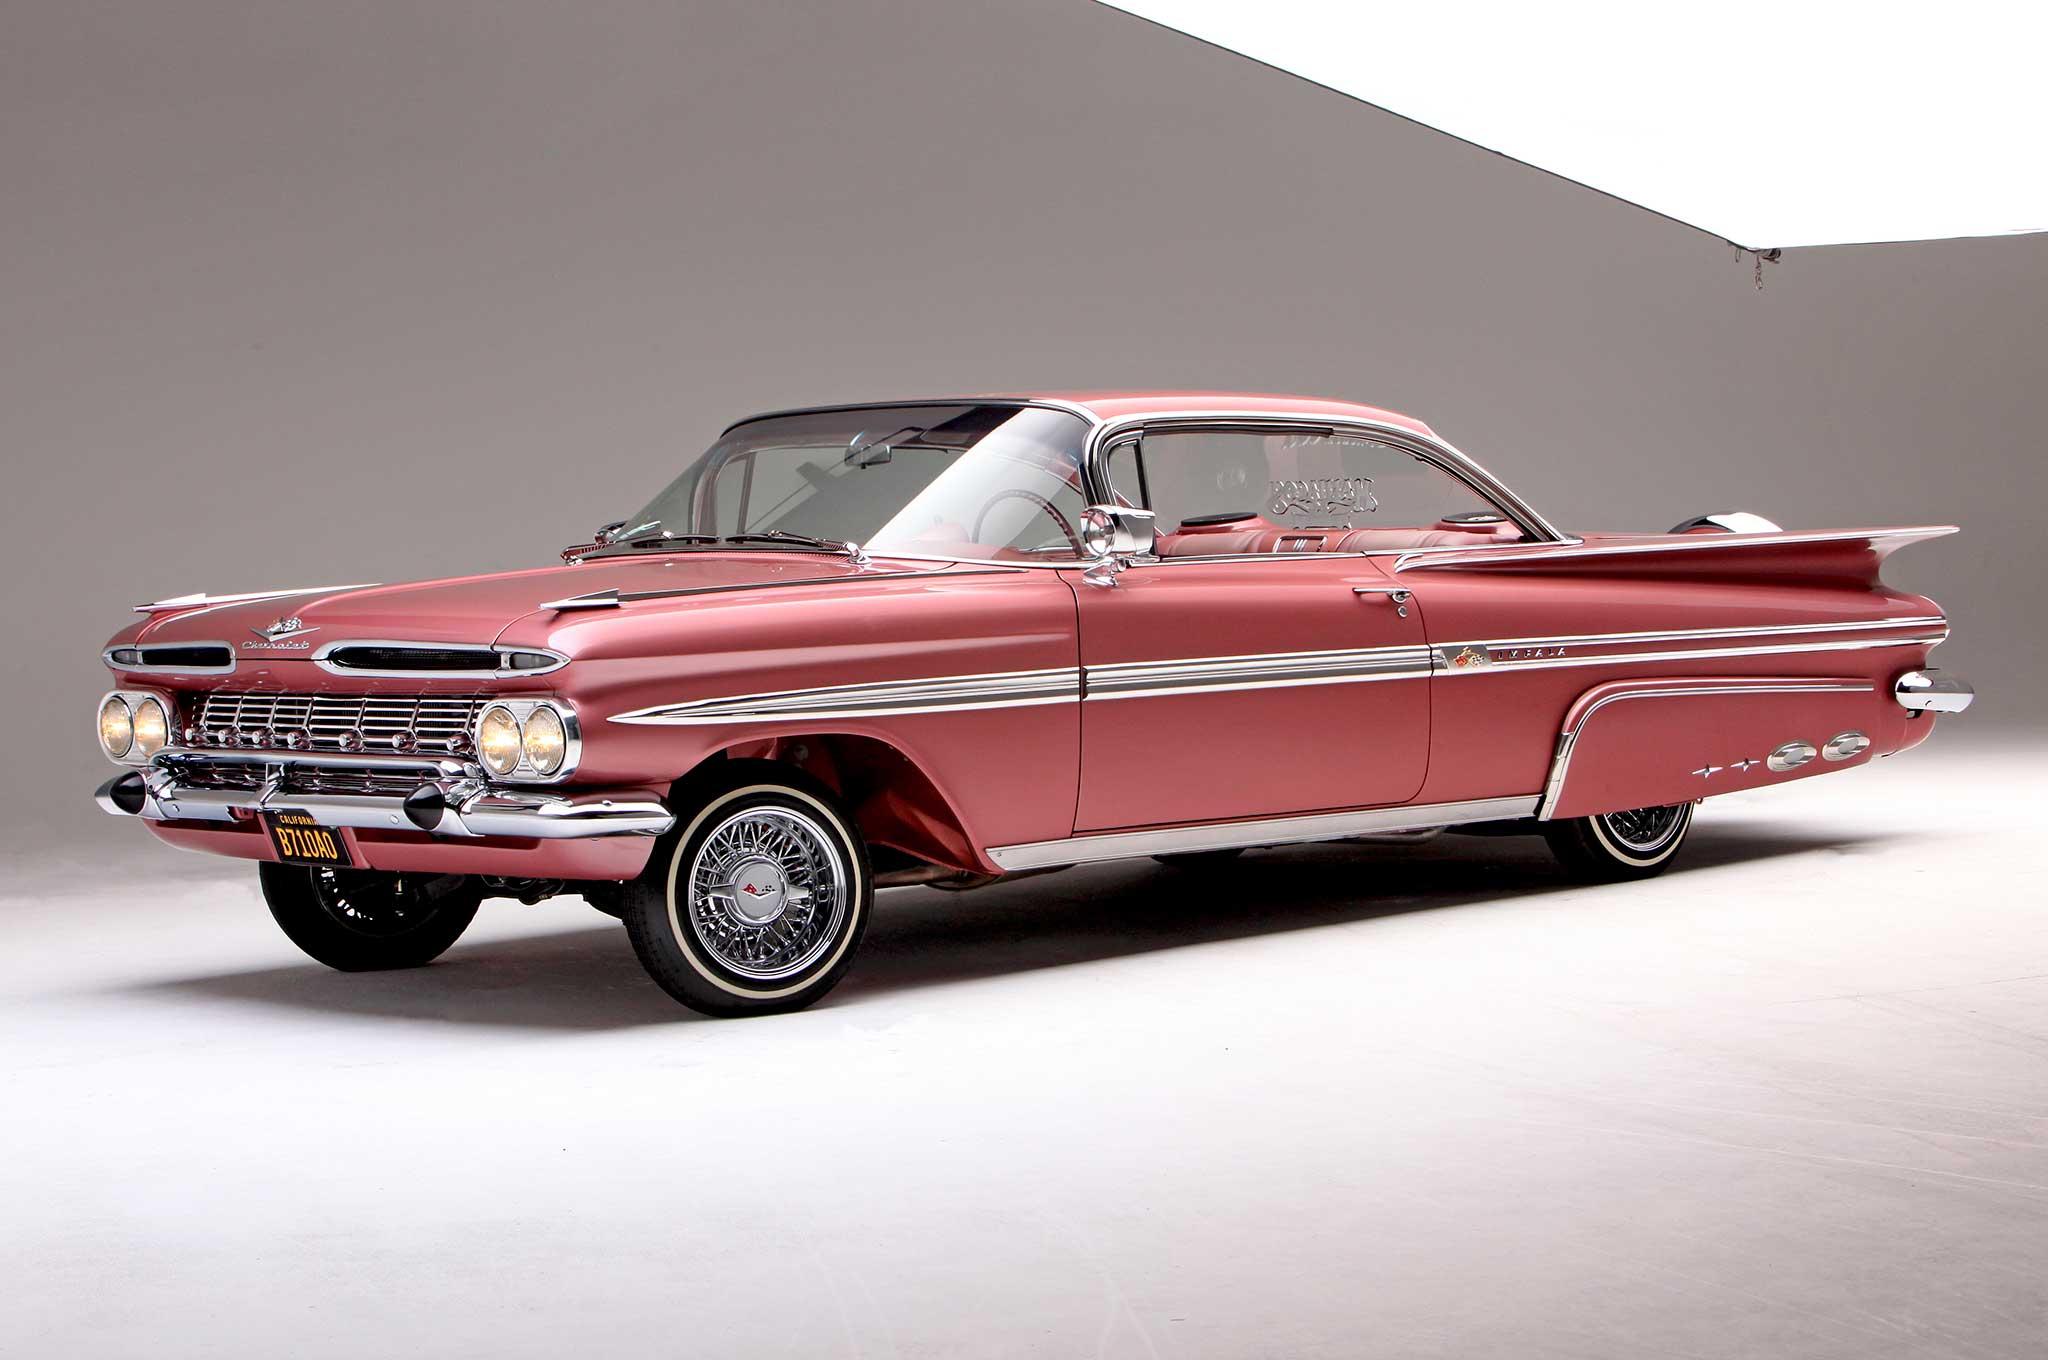 Cadillac Convertible 2015 >> 1959 Chevrolet Impala - Pinky's '59 - Lowrider